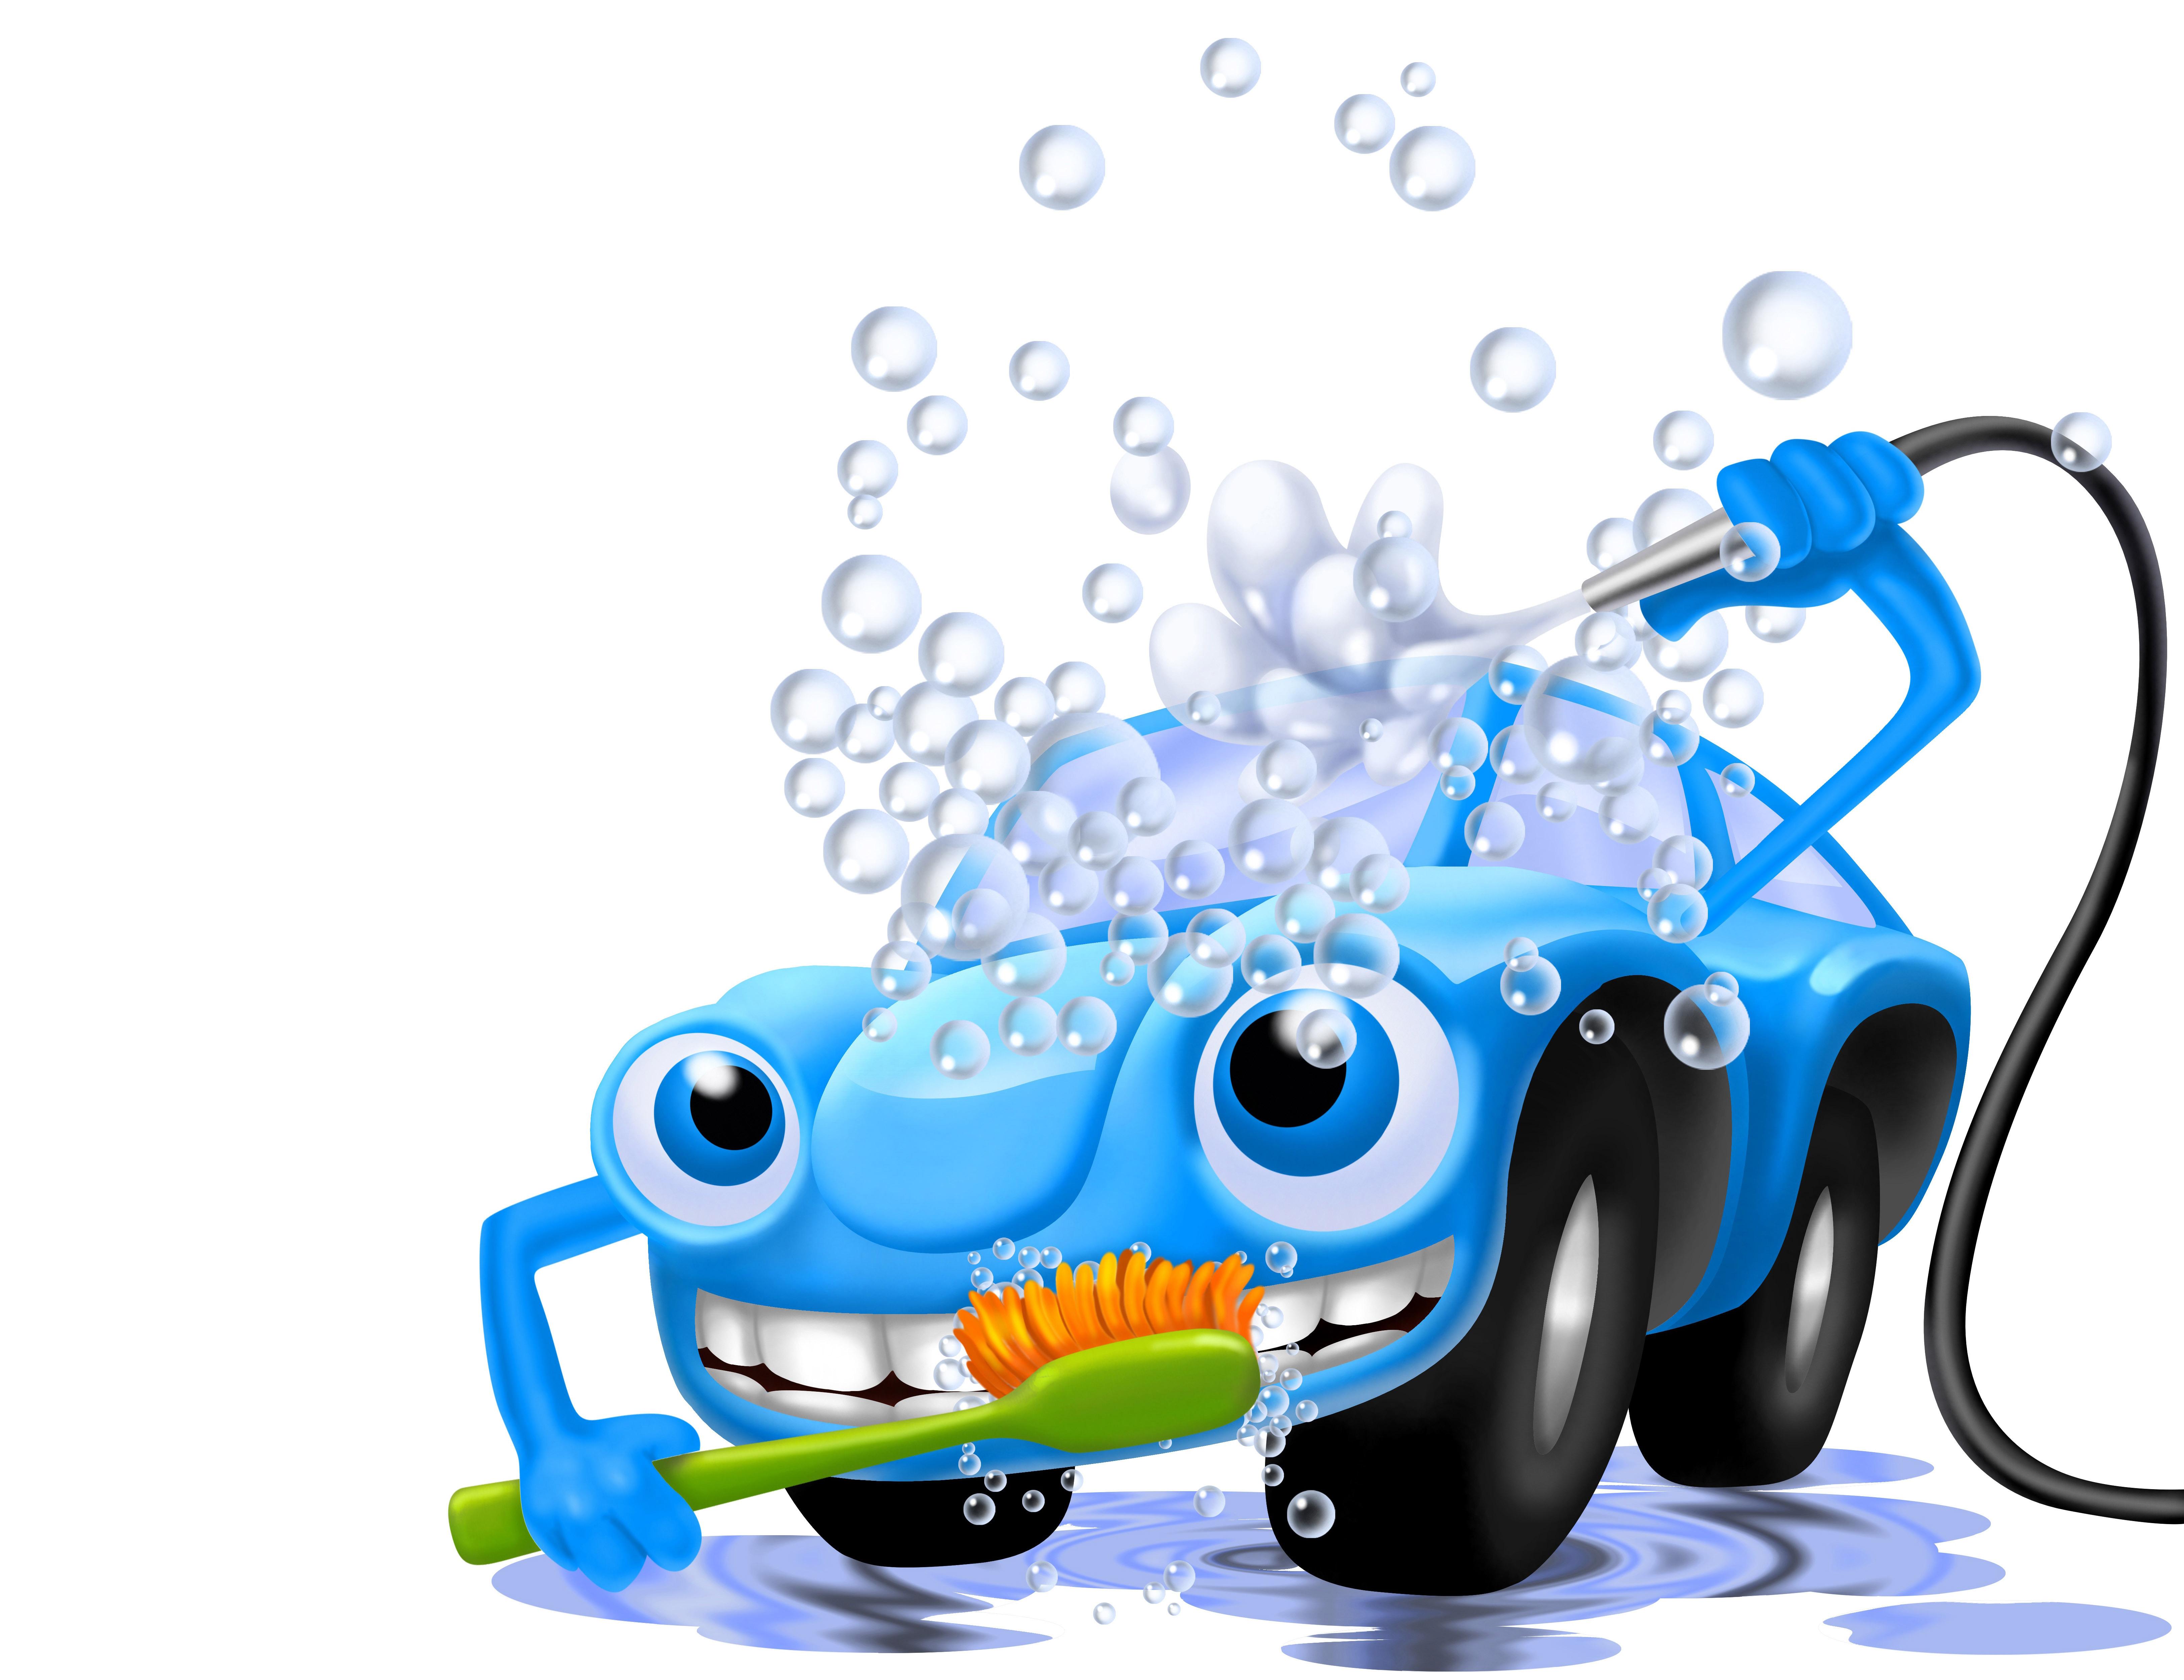 Images wash Teeth auto Vector Graphics 6500x5000 6500x5000